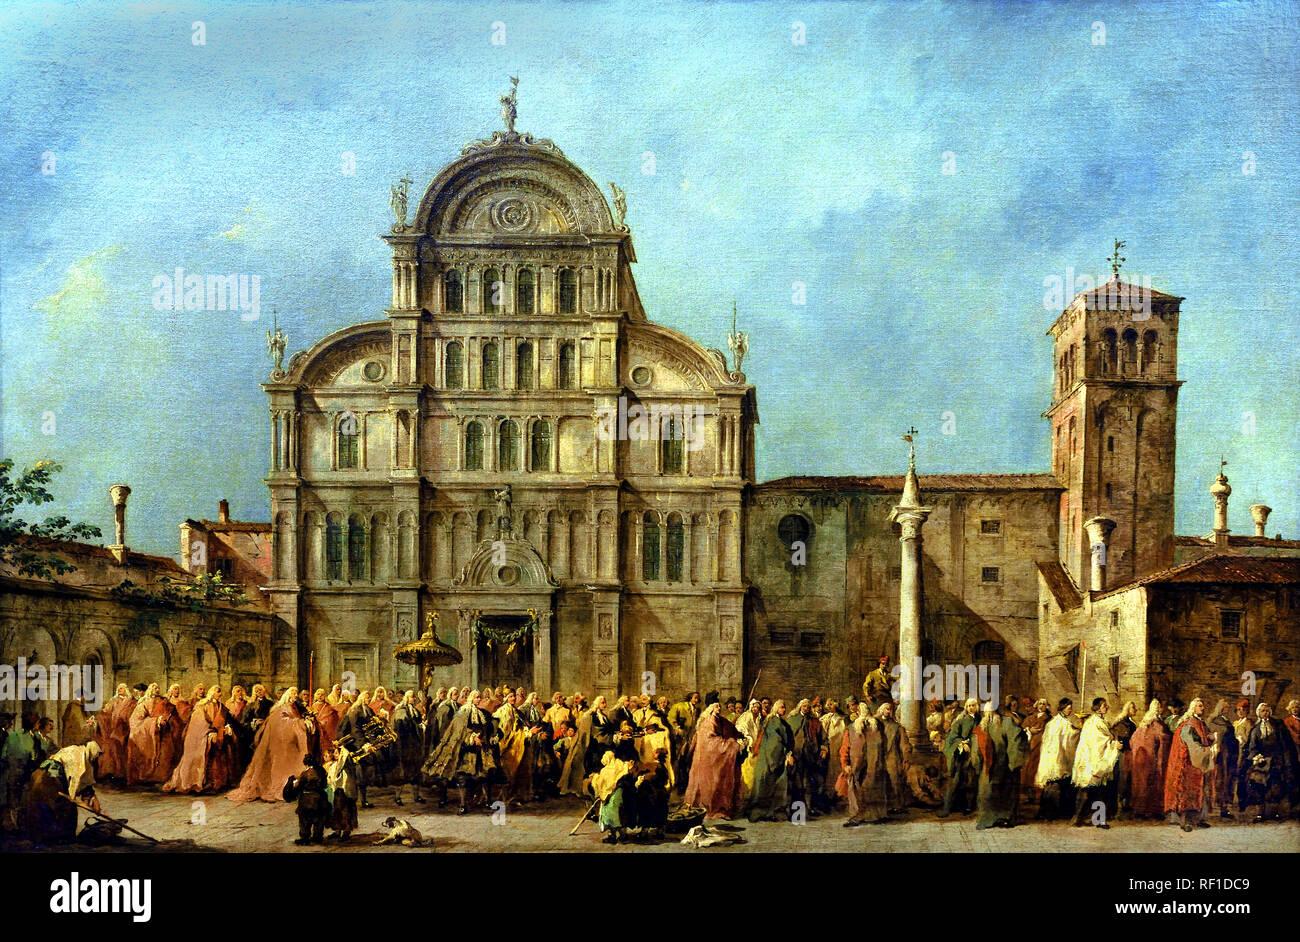 The Procession of the Doge of Venice at San Zaccaria  c. 1775–80, Francesco GUARDI, 1712 – 1793, Venice, Venetian, Italy, Italian, Stock Photo